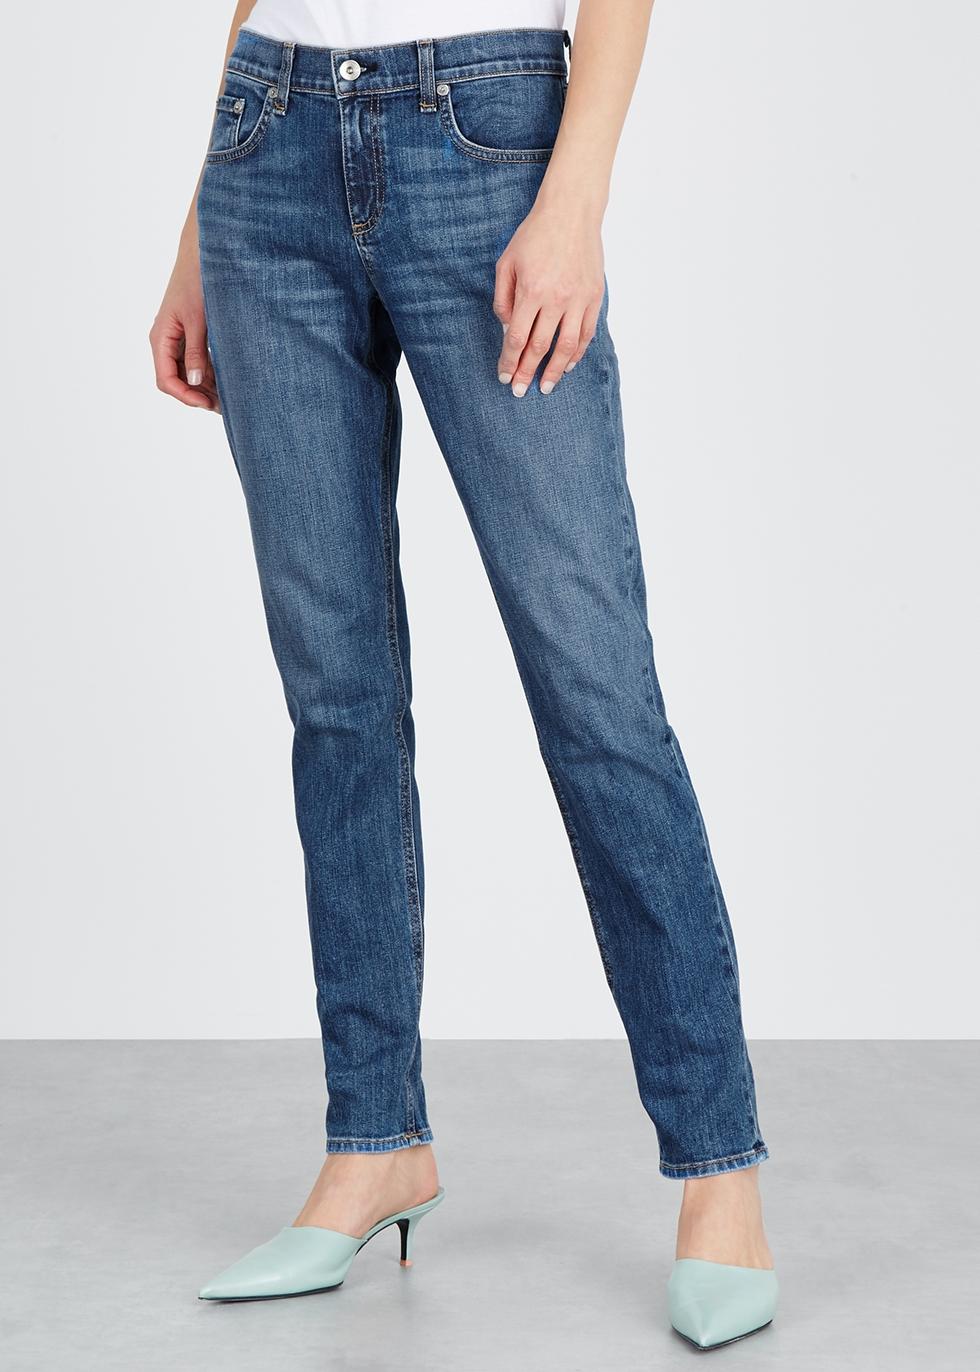 Dre blue slim-leg jeans - rag & bone